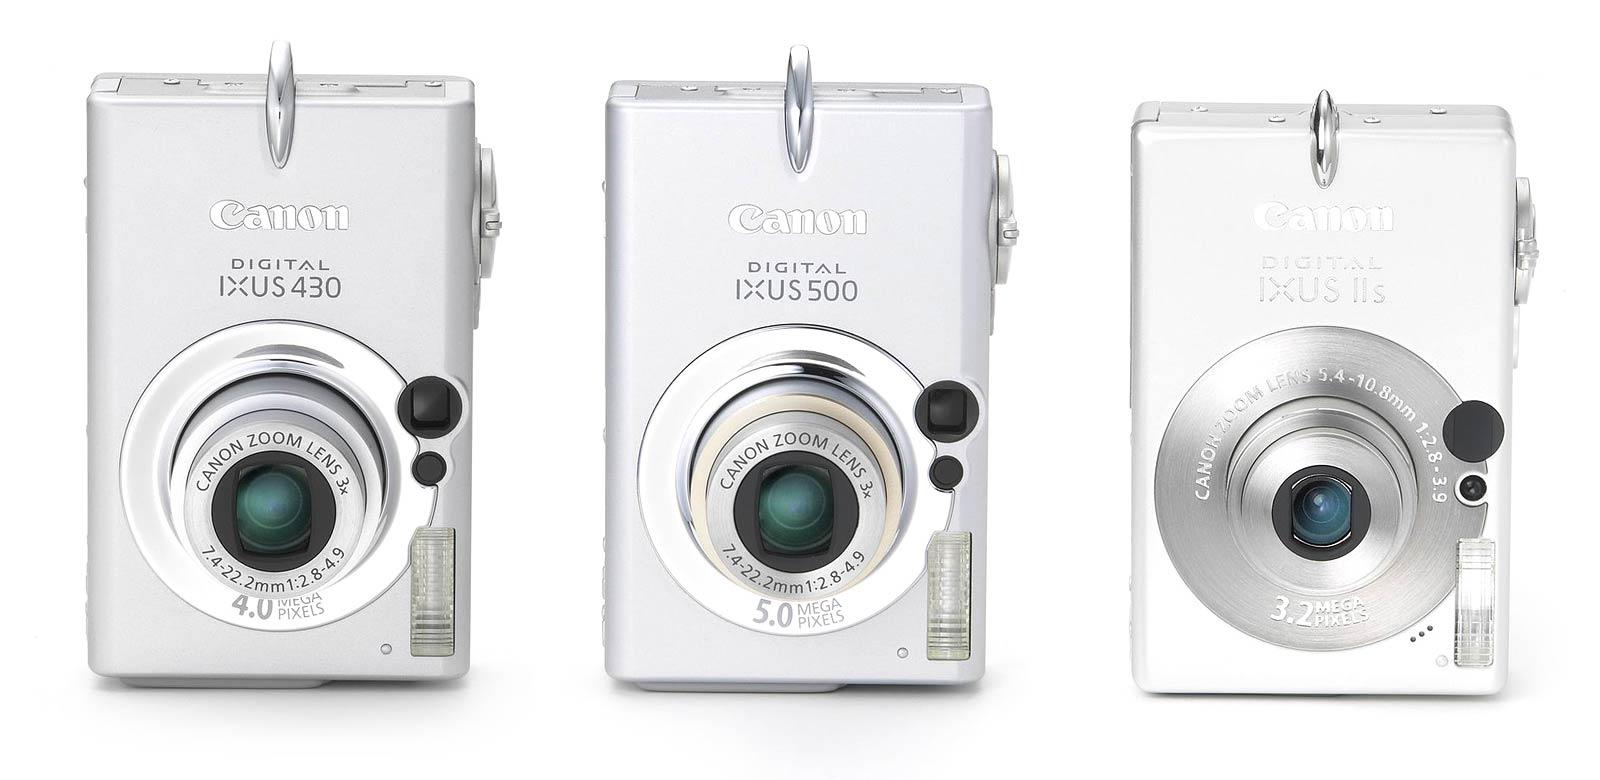 Canon Digital IXUS 430 Camera WIA 64 Bit